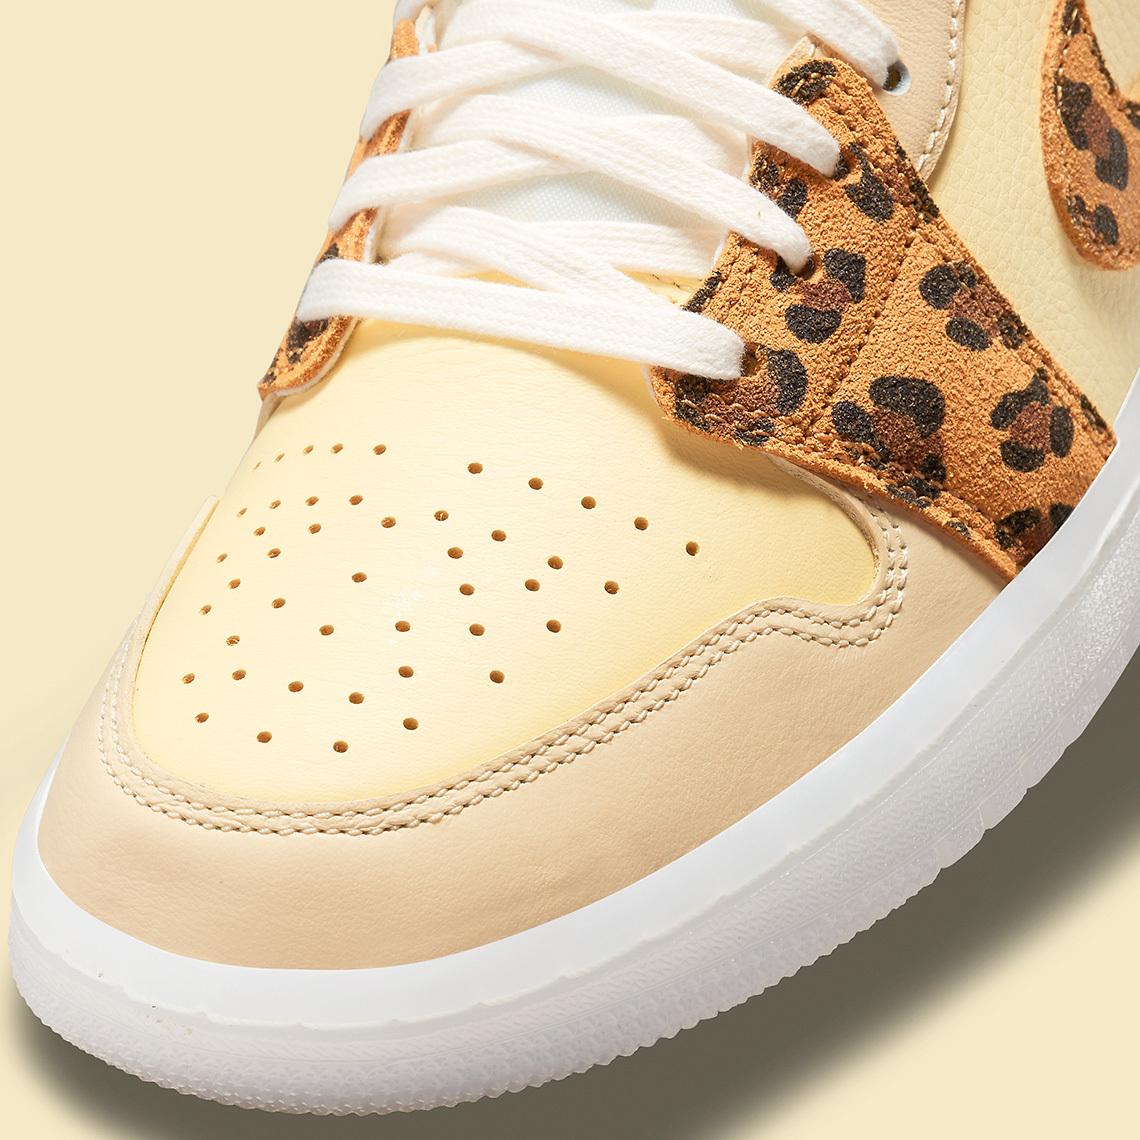 Air Jordan 1 Low SNKRS Leopard